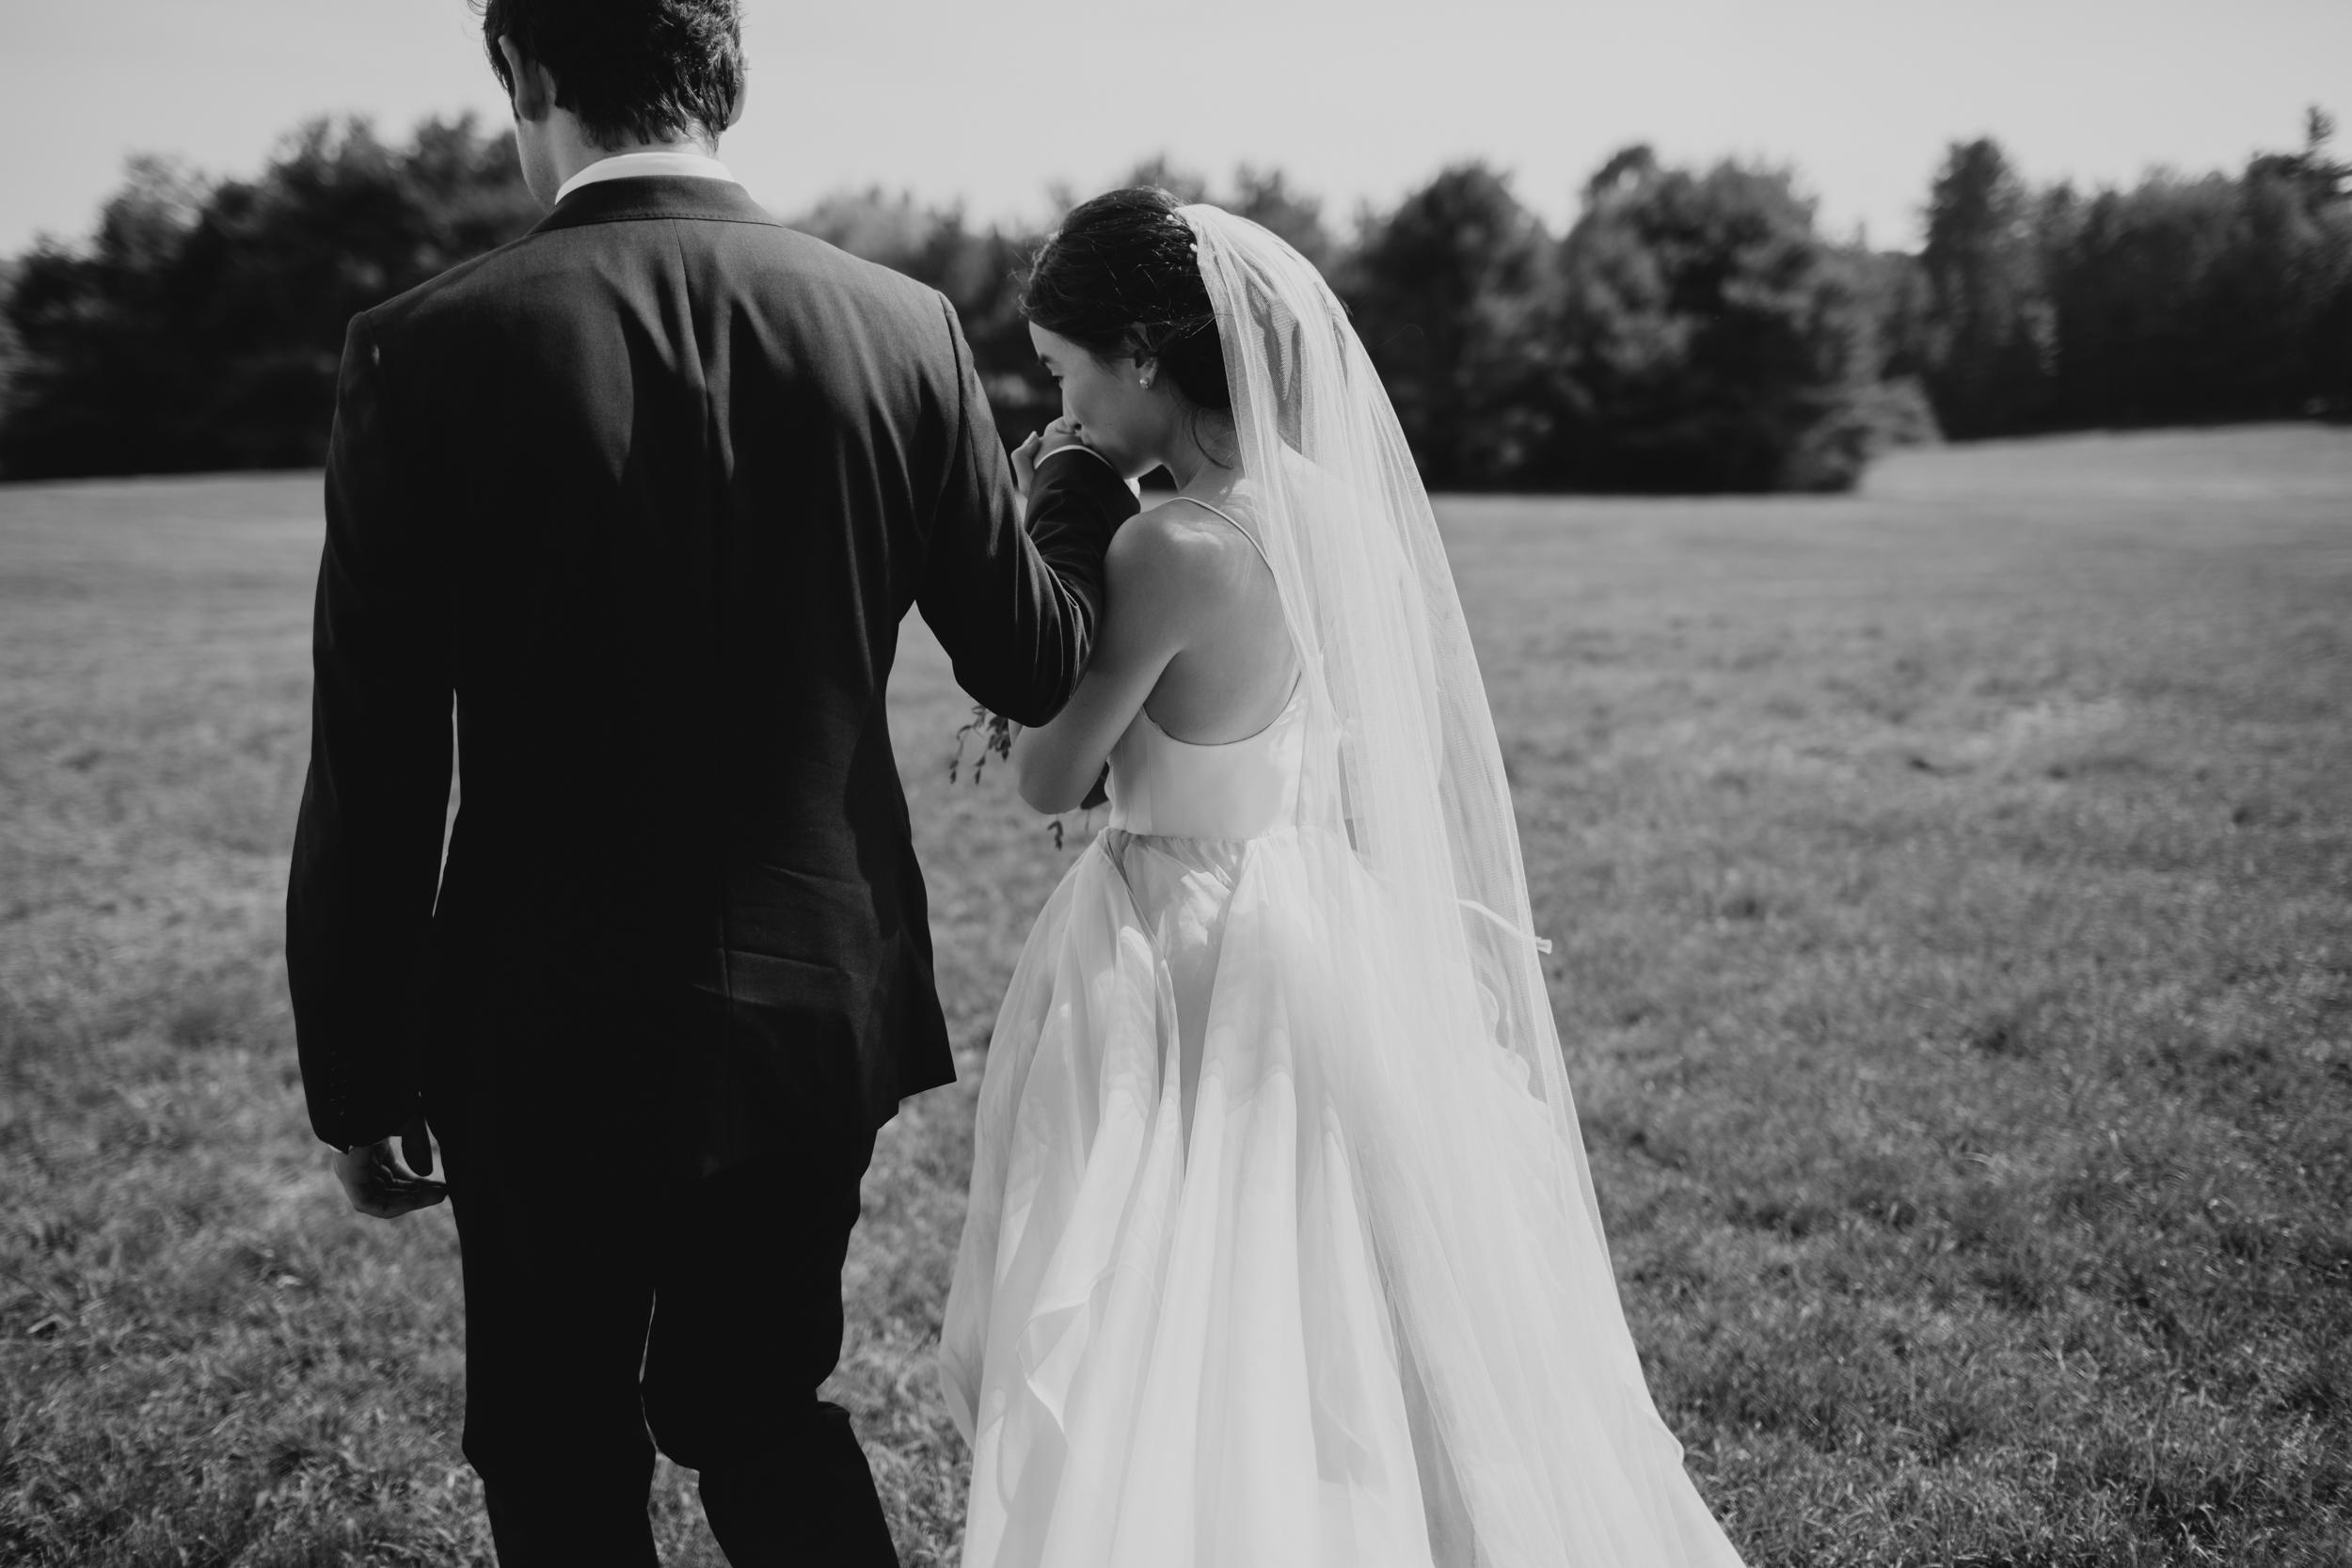 william_allen_farm_wedding_pownal_maine_ilkatayler-19.jpg